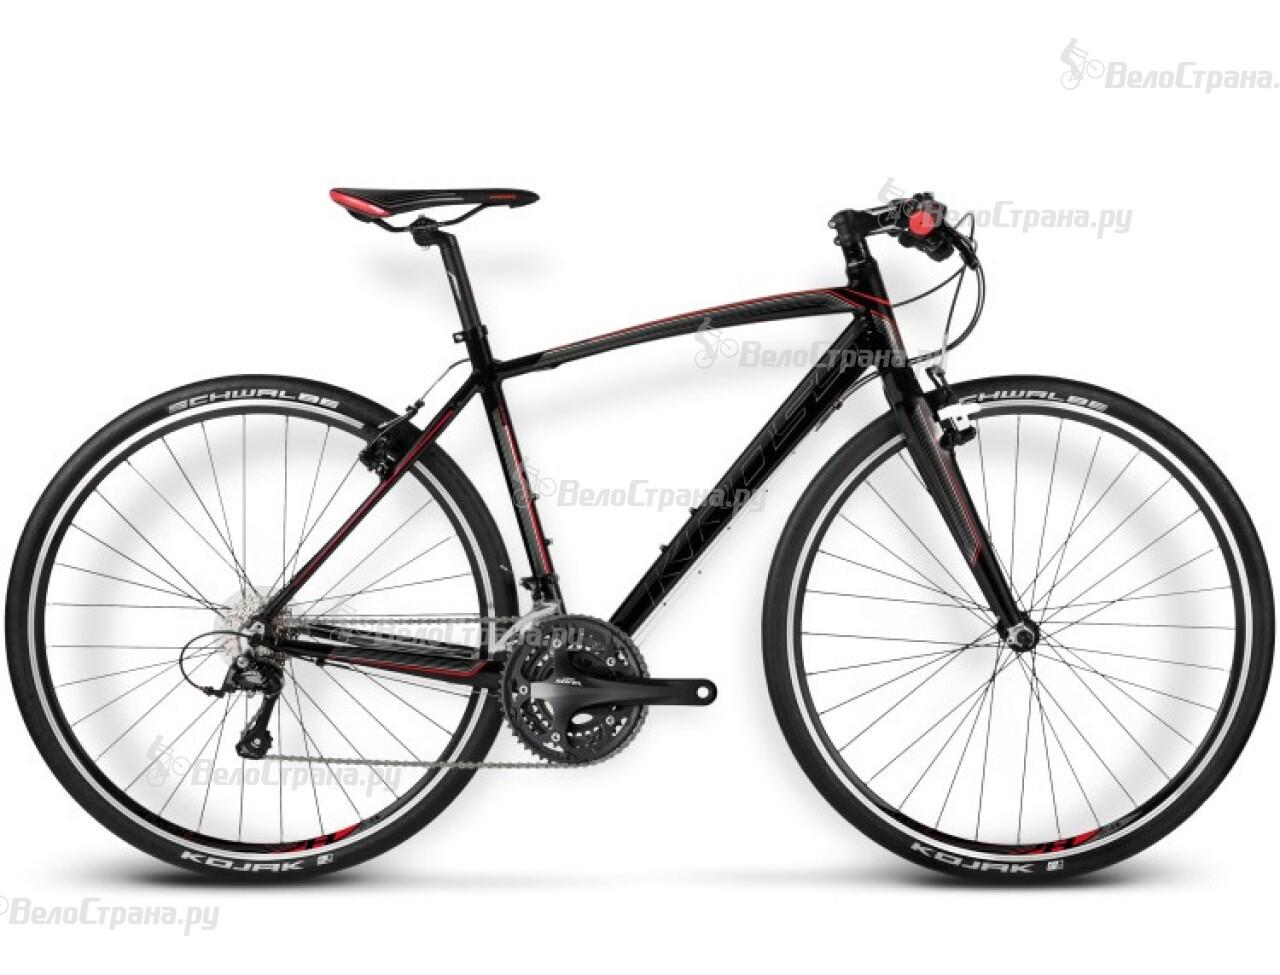 Велосипед Kross Pulso 2 (2015) велосипед kross flex 2 0 2015